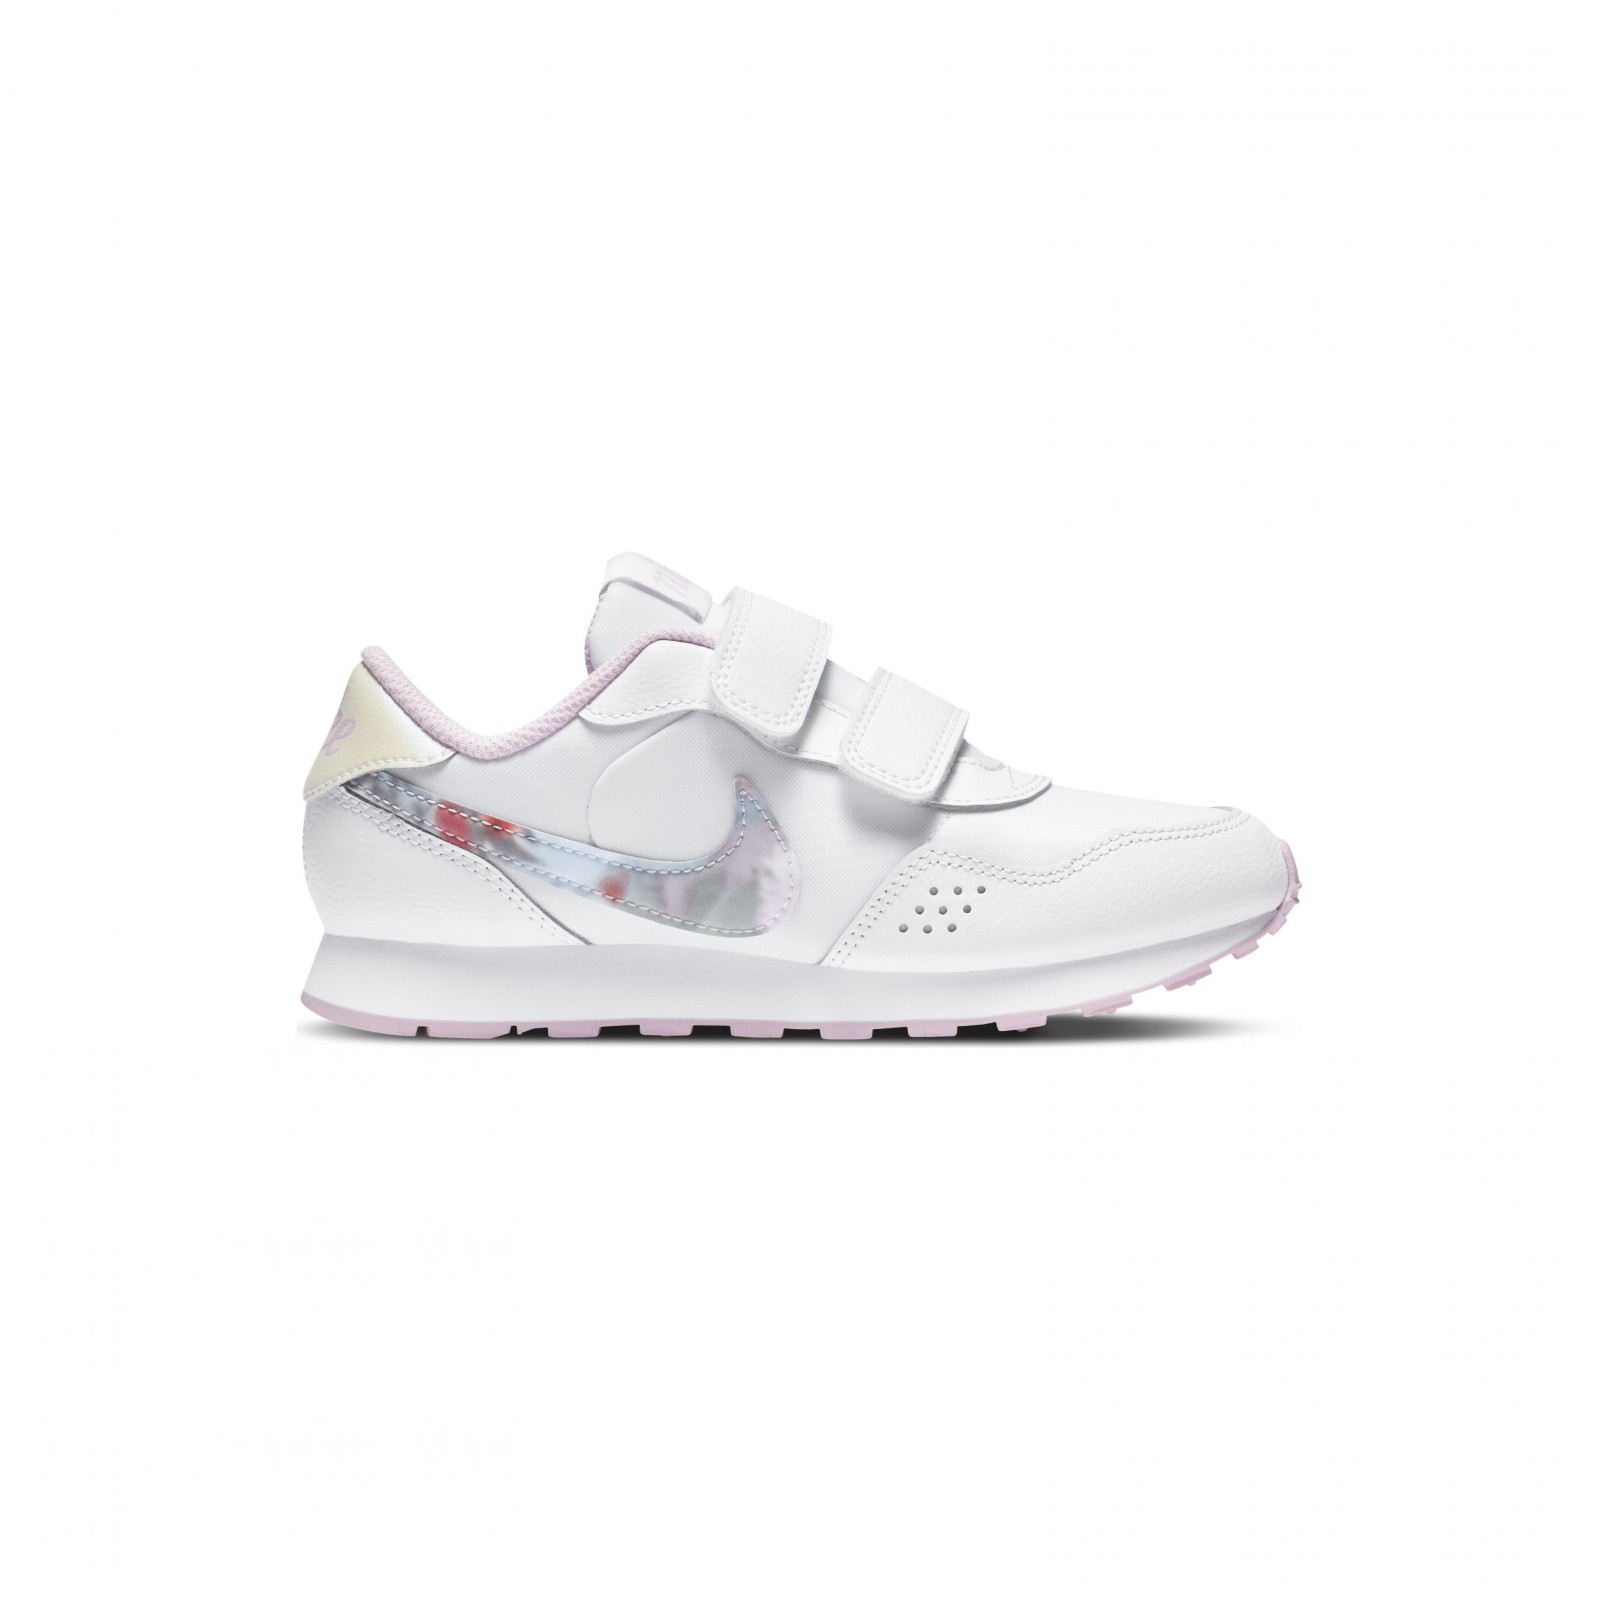 Nike md valiant flrl (psv) WHITE/LT ARCTIC PINK-LT ARCTIC PINK